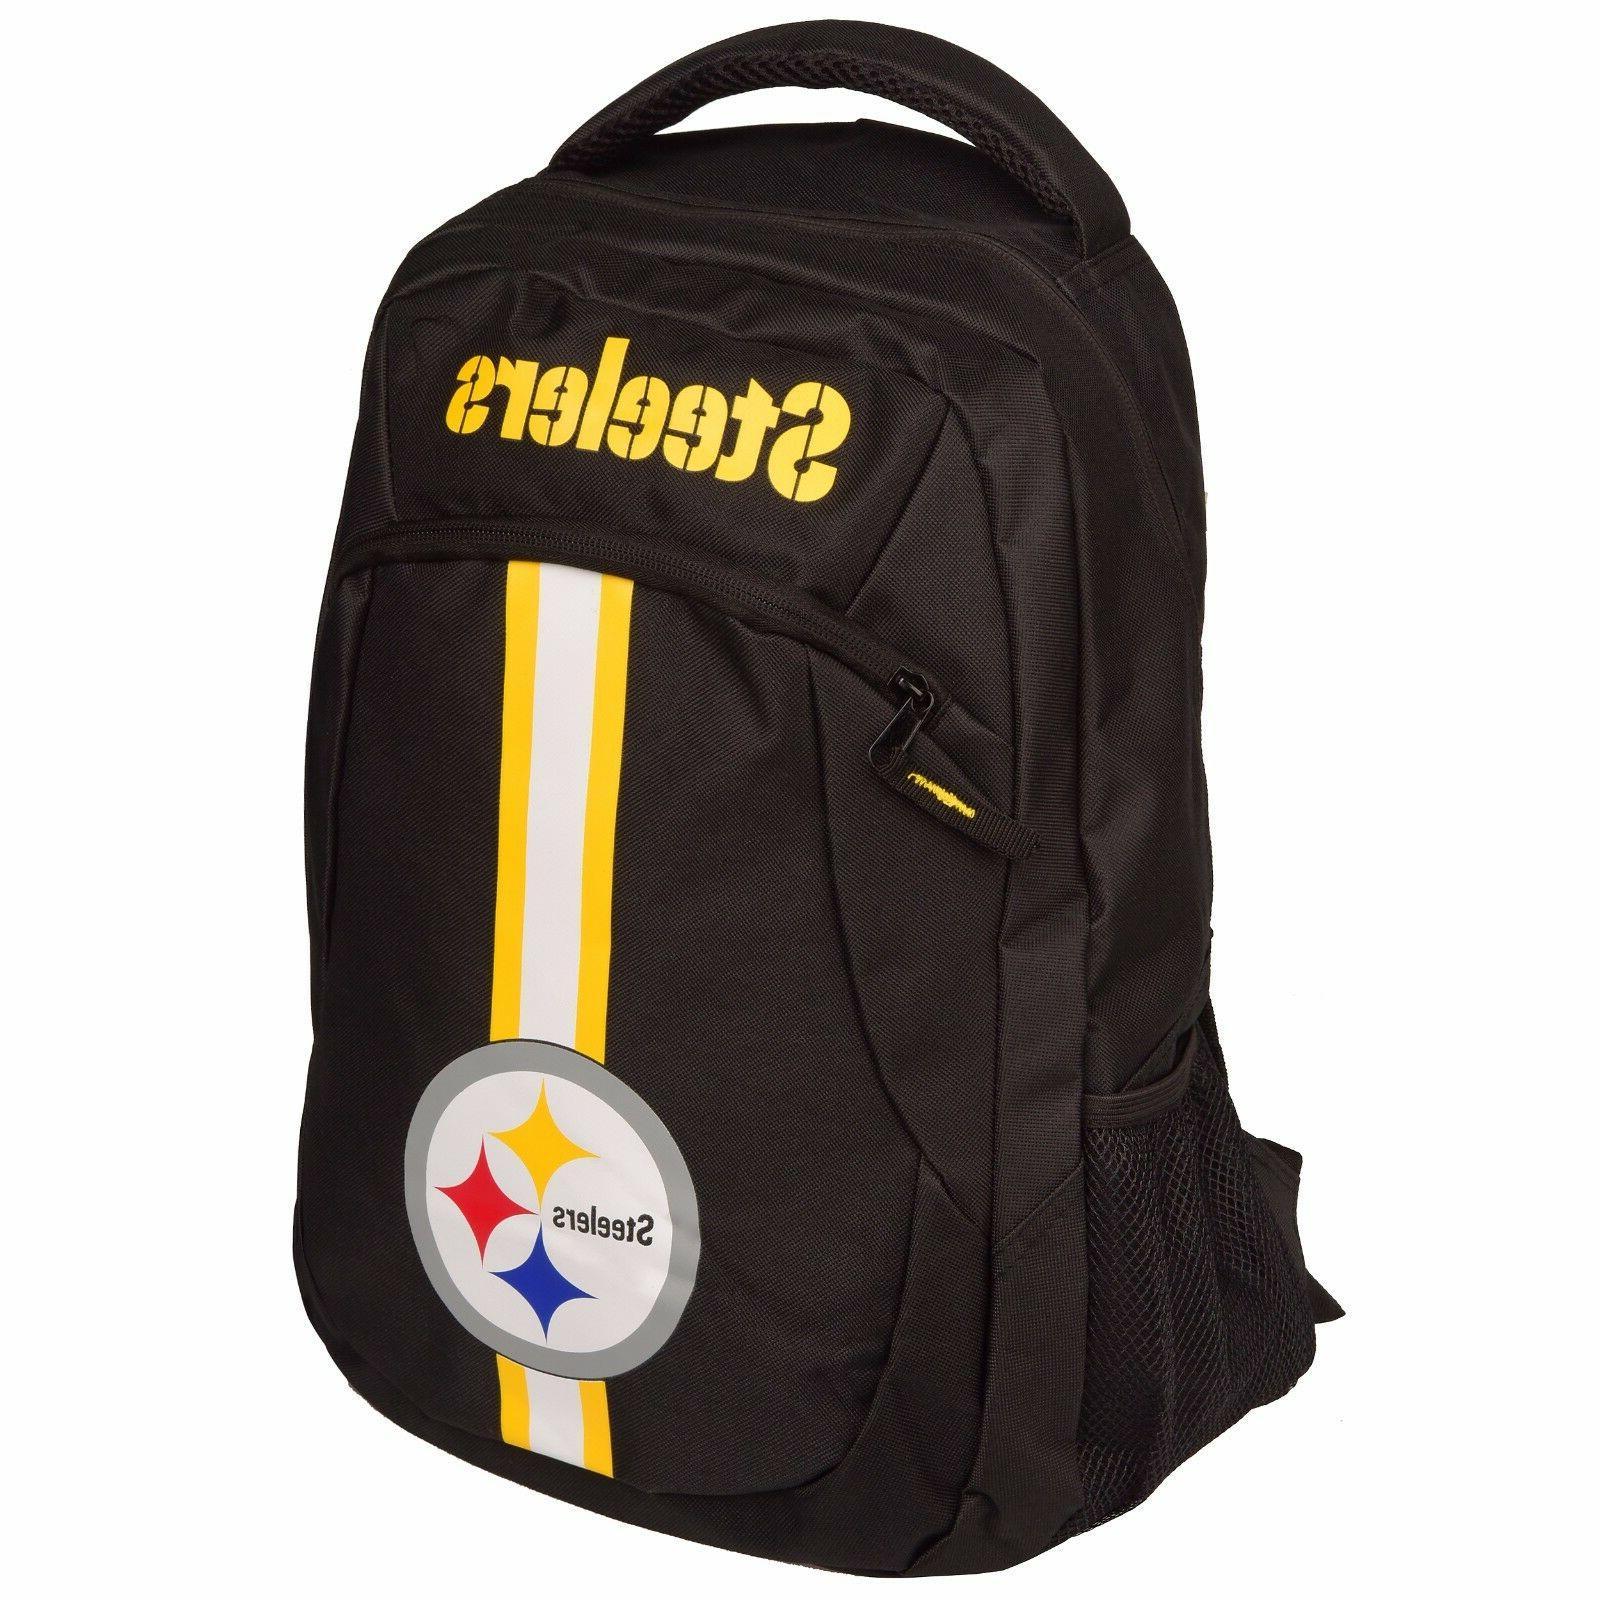 pittsburgh steelers logo action backpack school bag